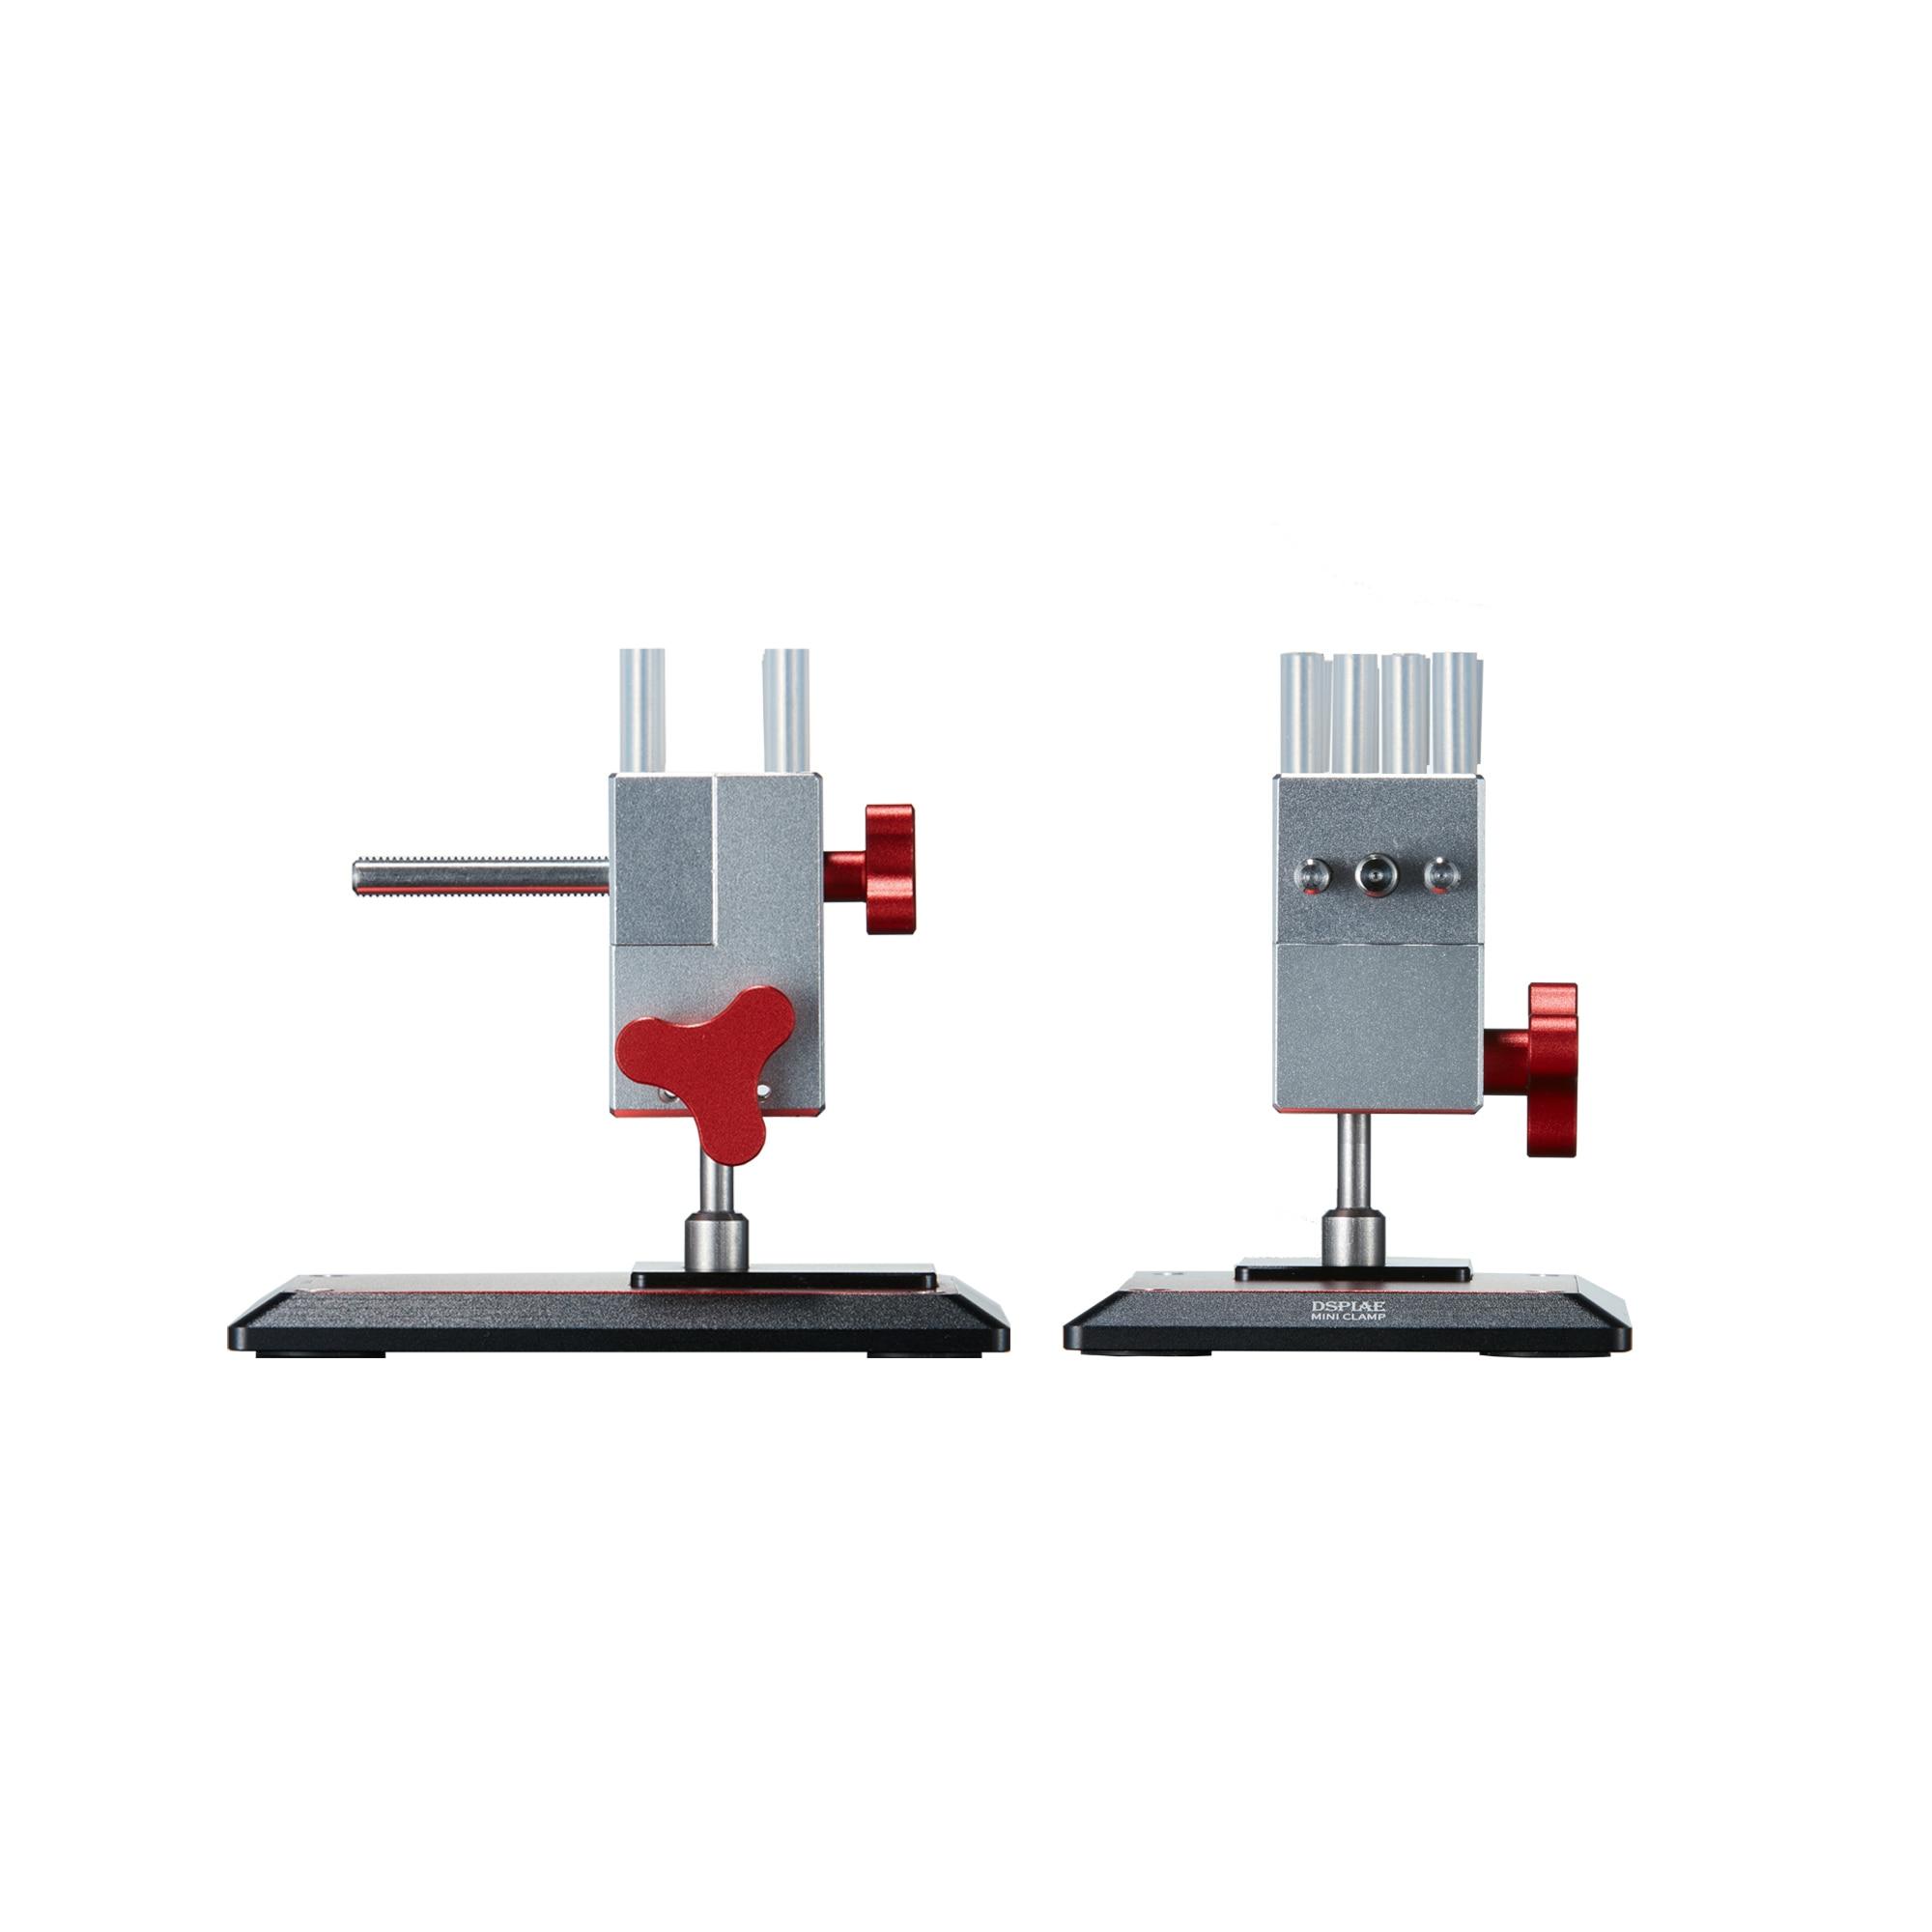 home improvement : WULIAN FANYANG FY-XF300H FY-XF300 XF-300 Plasma Straight Plasma Cutting Machine Gun 1PCS